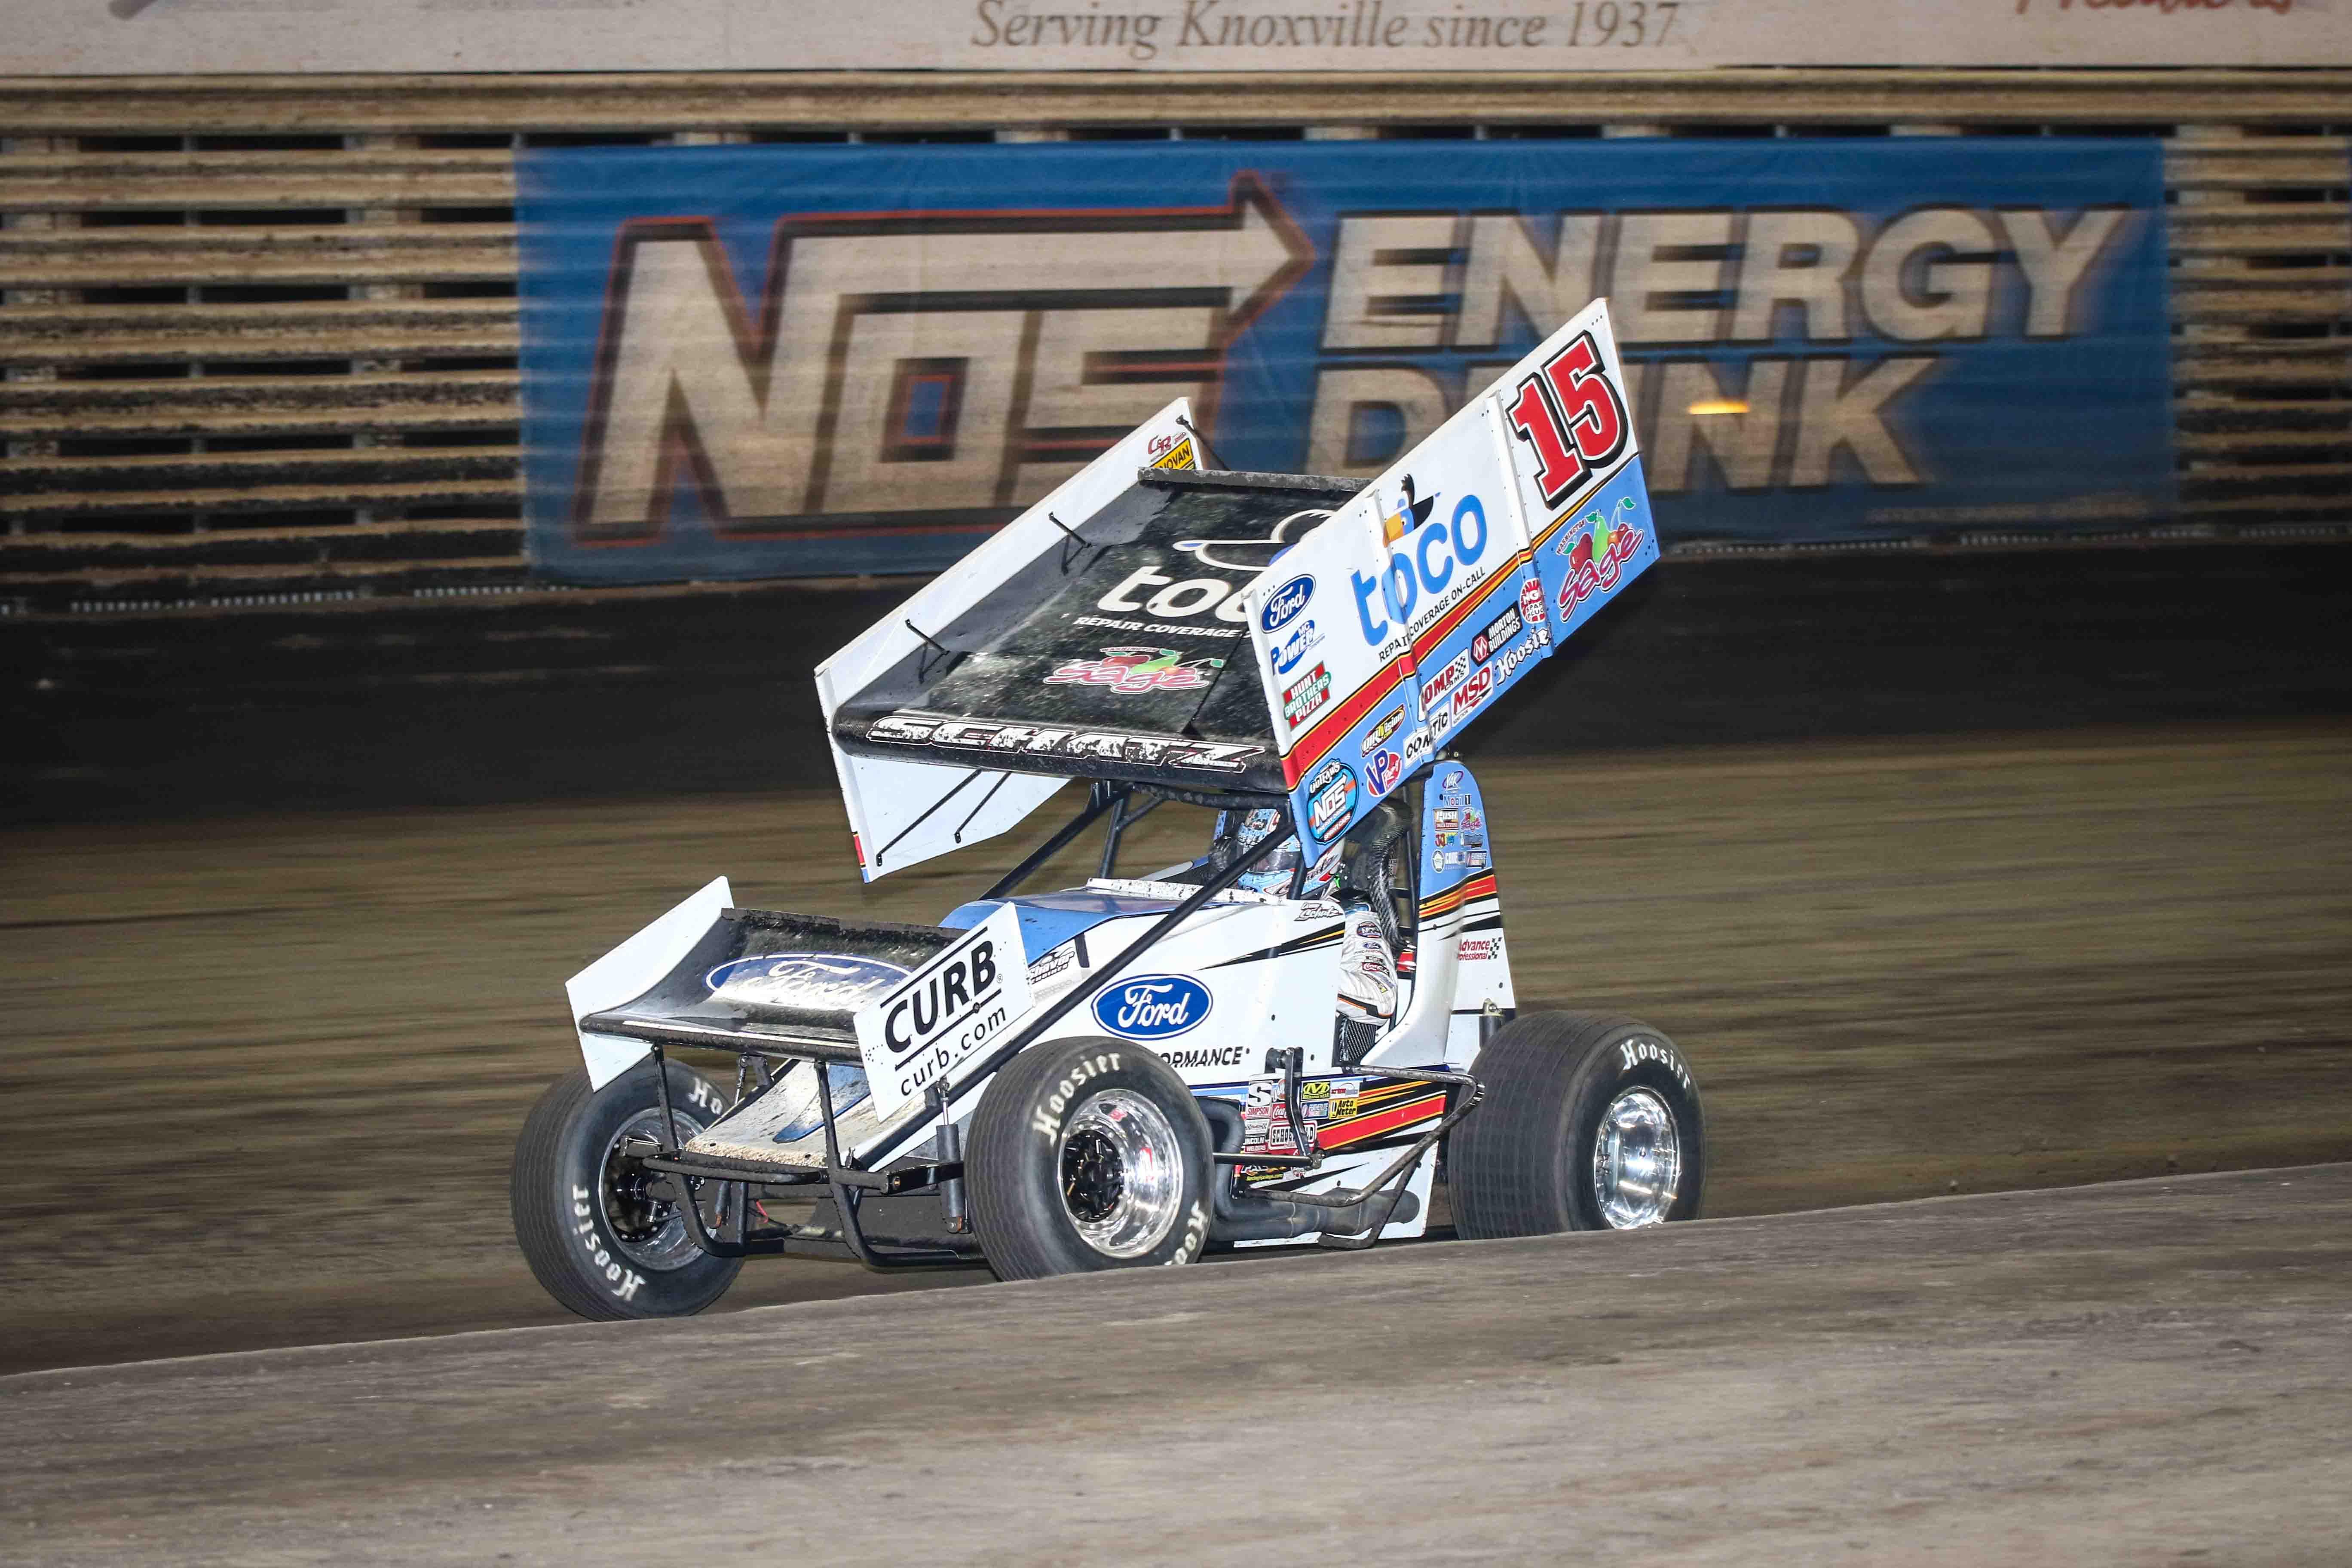 Donny Schatz, Knoxville Raceway, Knoxville Natioanls